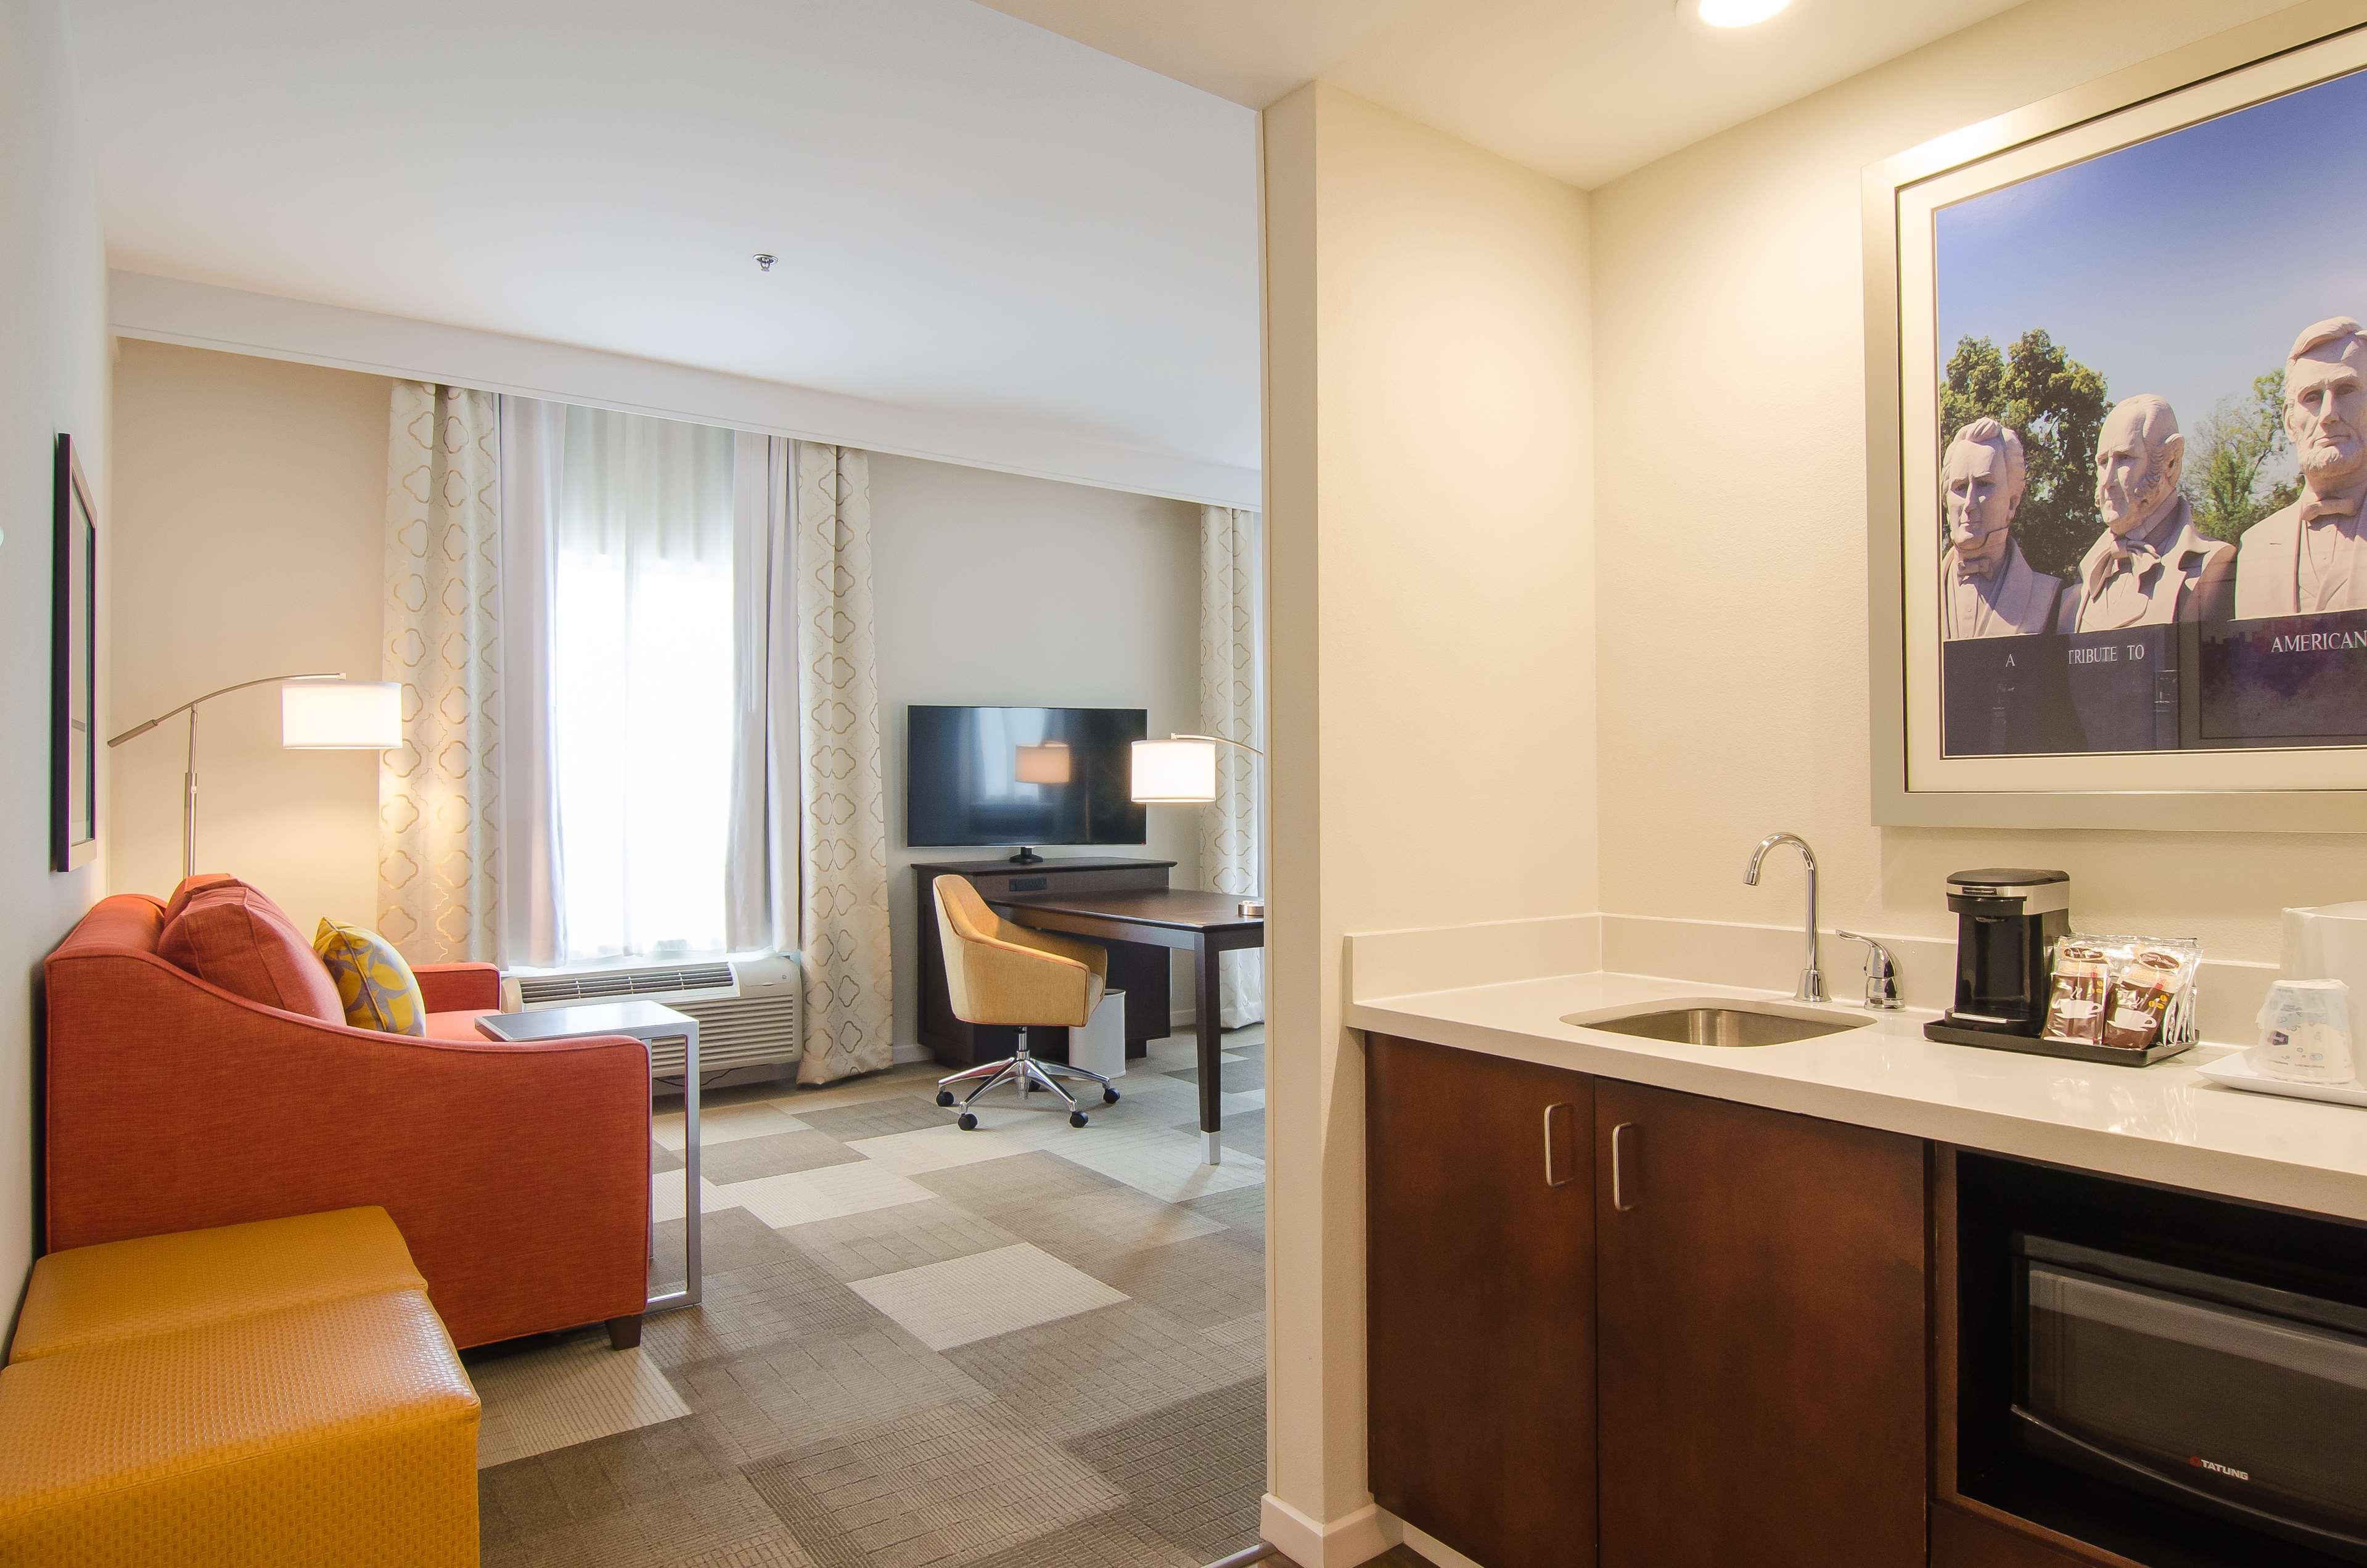 Hampton Inn & Suites Houston North IAH image 18